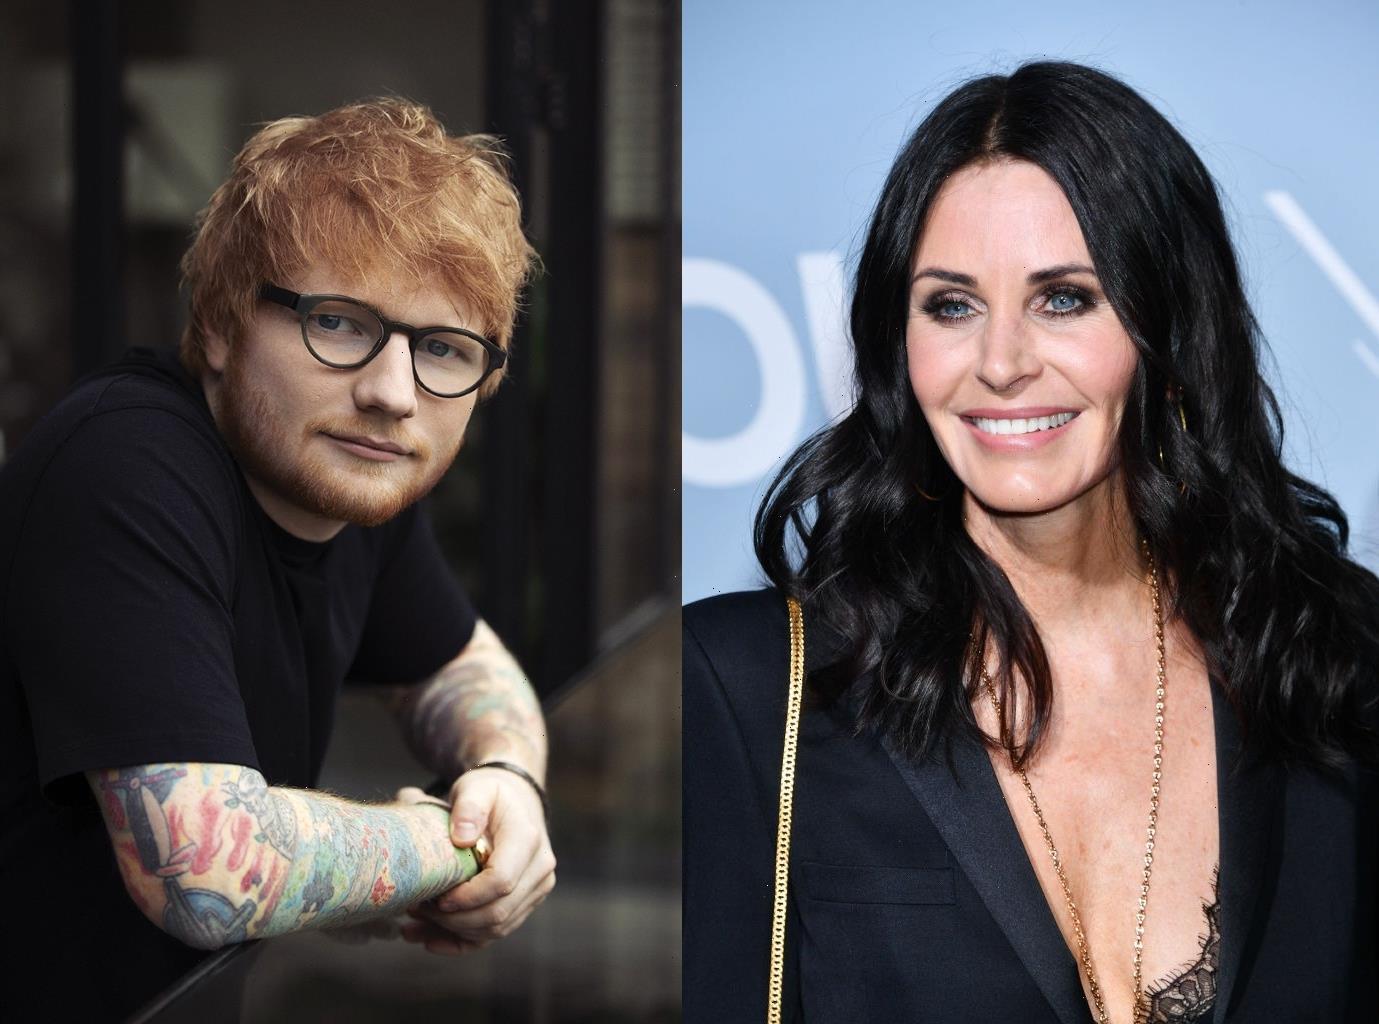 Courteney Cox, Ed Sheeran Recreate Ross and Monica's 'Friends' Routine